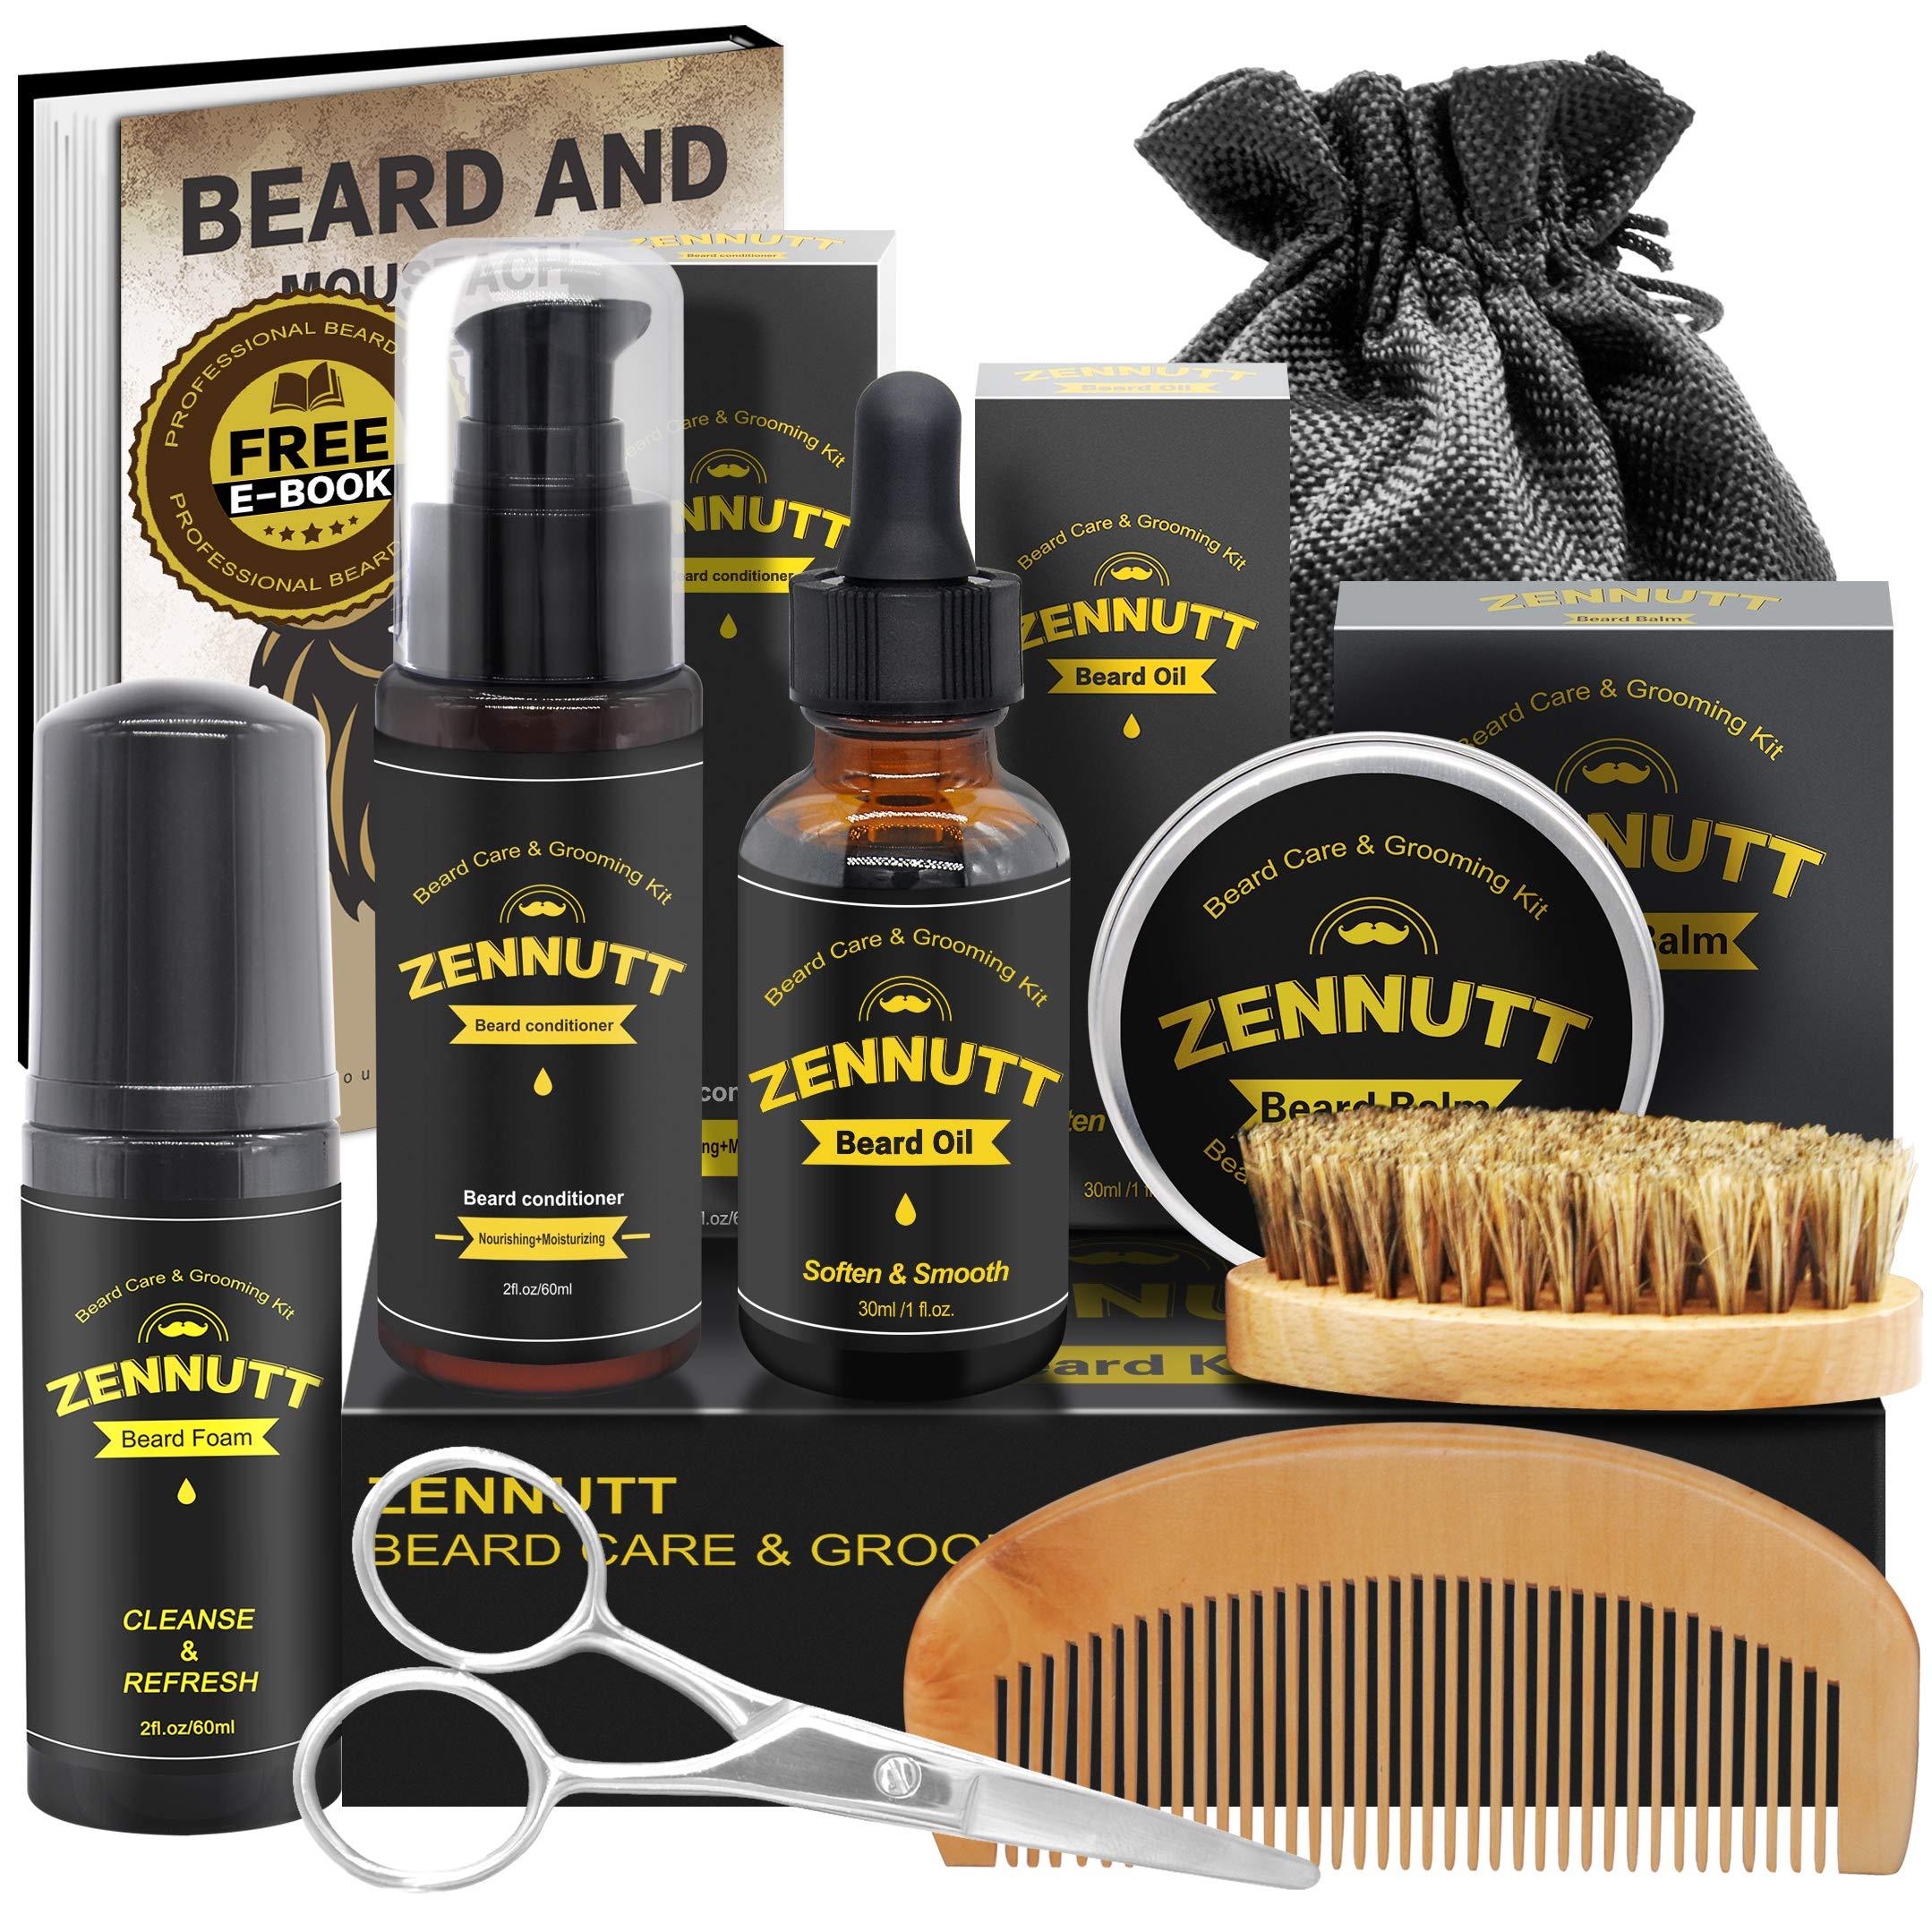 Beard Kit,Beard Growth Care Grooming Kit w/Beard Foam/Shampoo,Beard Conditioner,Beard Growth Oil,Beard Balm,Beard Brush,Beard Comb,Scissors,Beard Shaper,Best Beard Mens Gifts for Men Dad Him Christmas